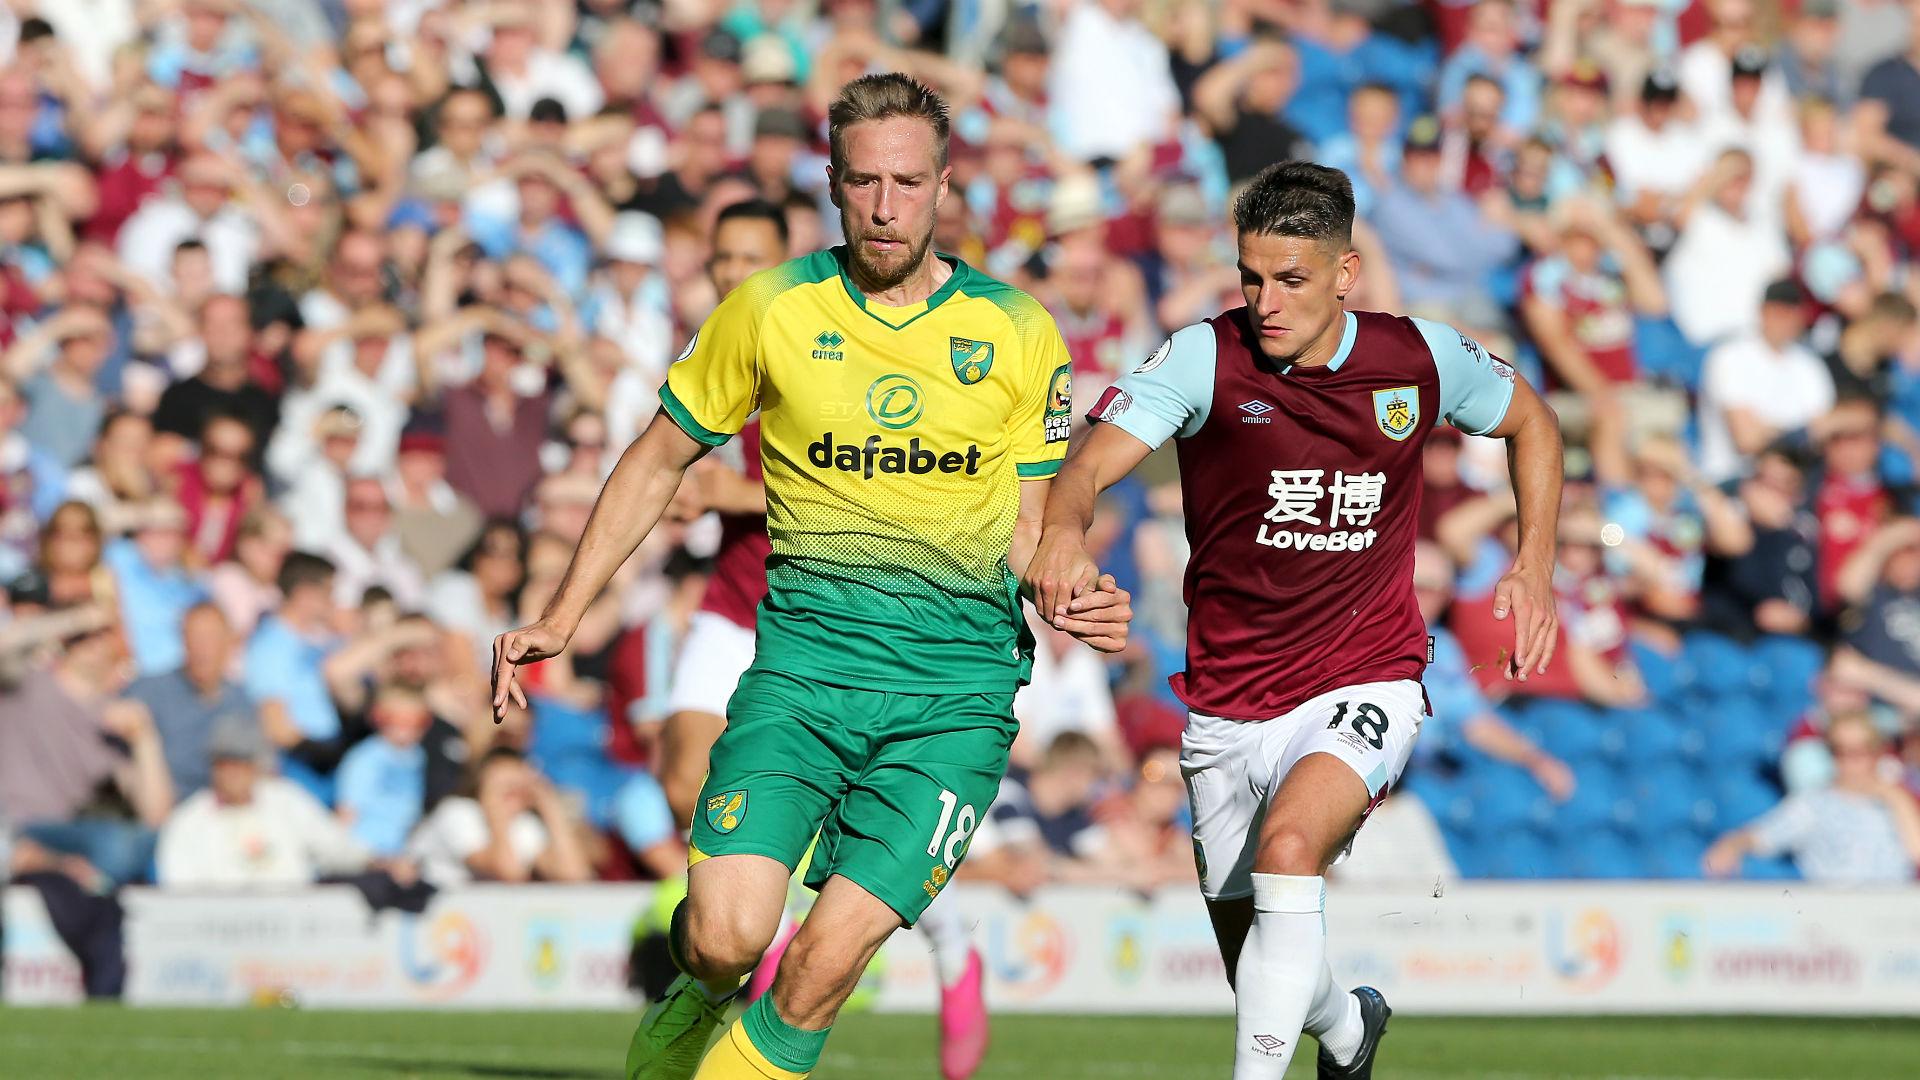 Coronavirus: Stiepermann back for Norwich City after COVID-19 positive test